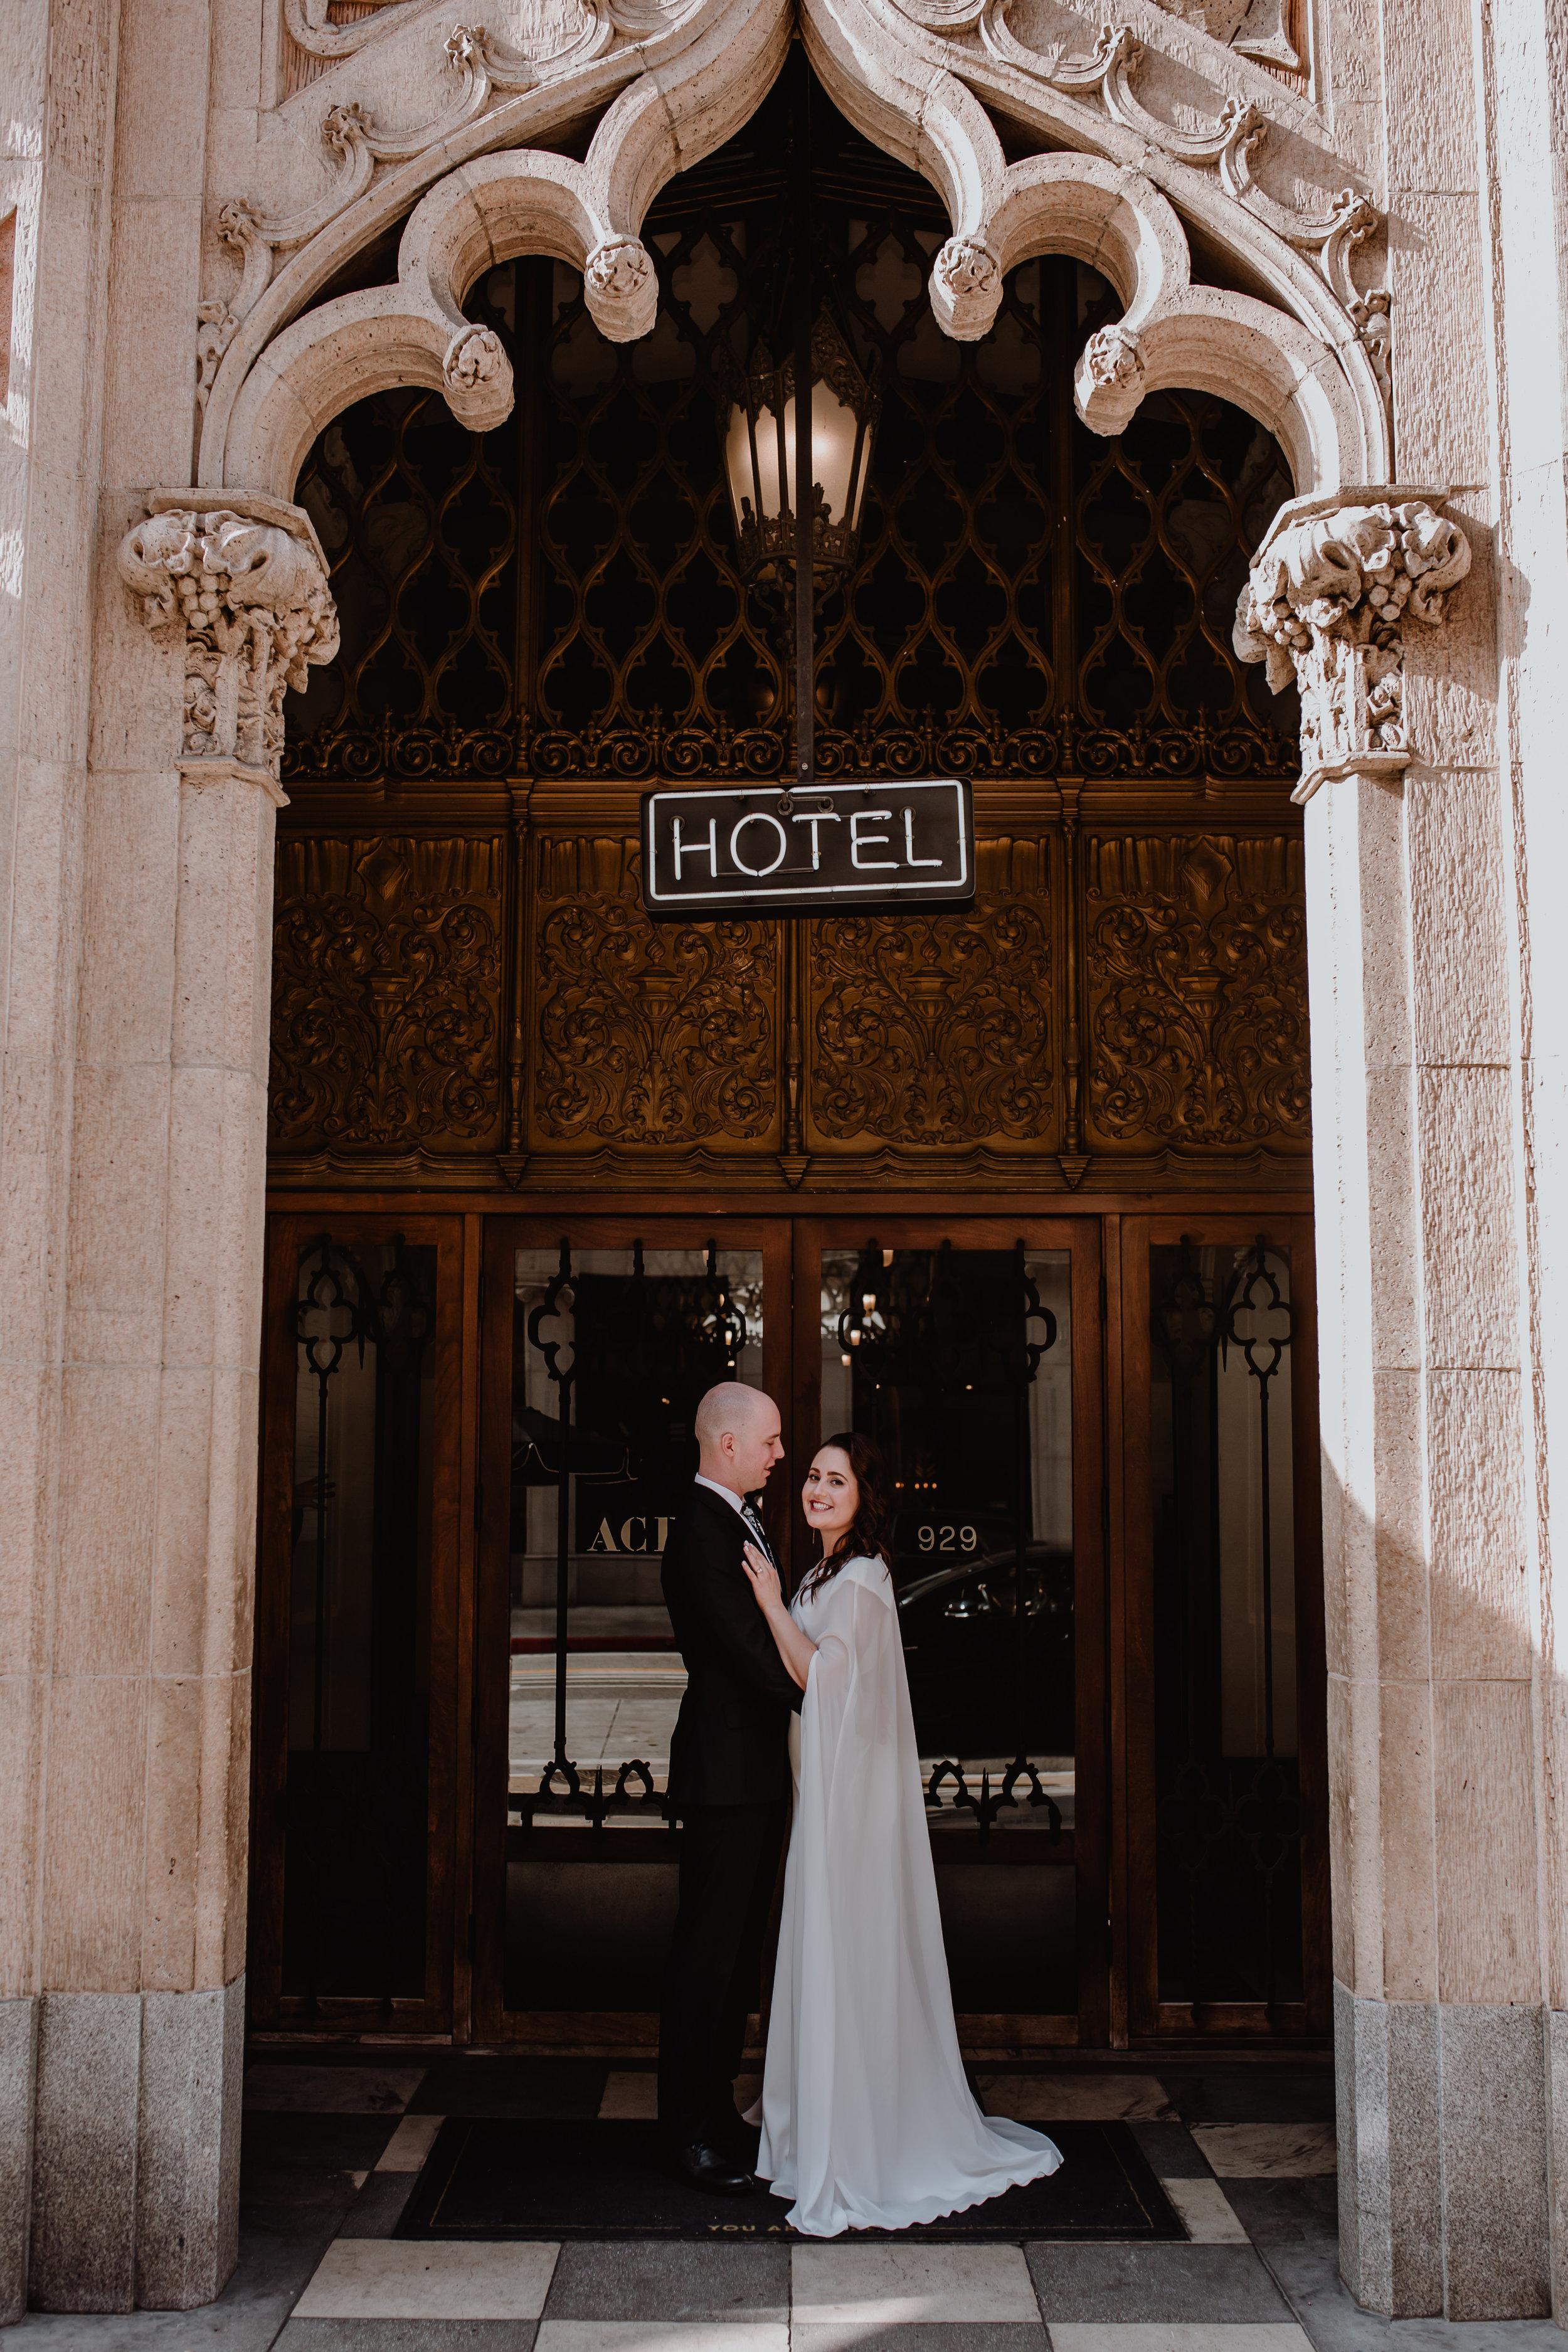 Sarah and Jared Ace Hotel Milwick Wedding-2031.jpg